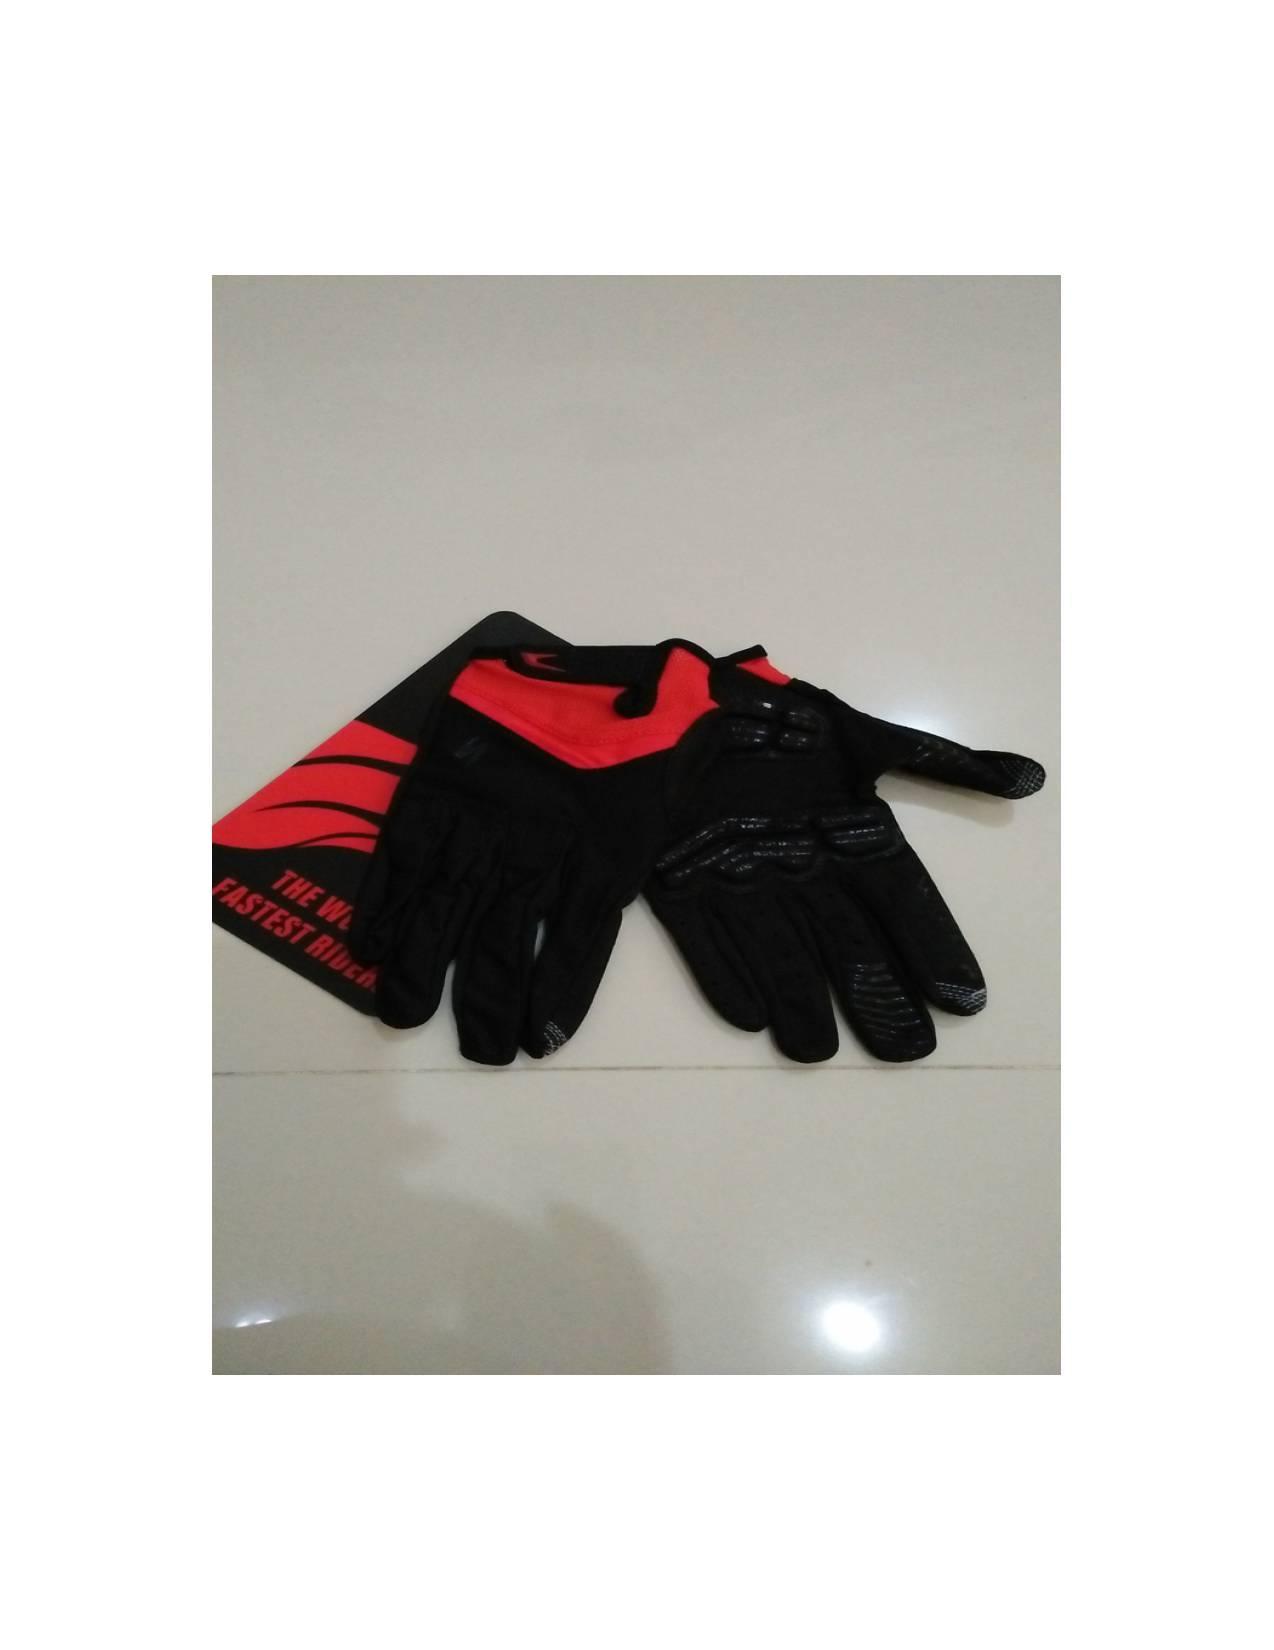 Promo Sarung Tangan Gel Specialized Full Finger Warna Hitam List Merah